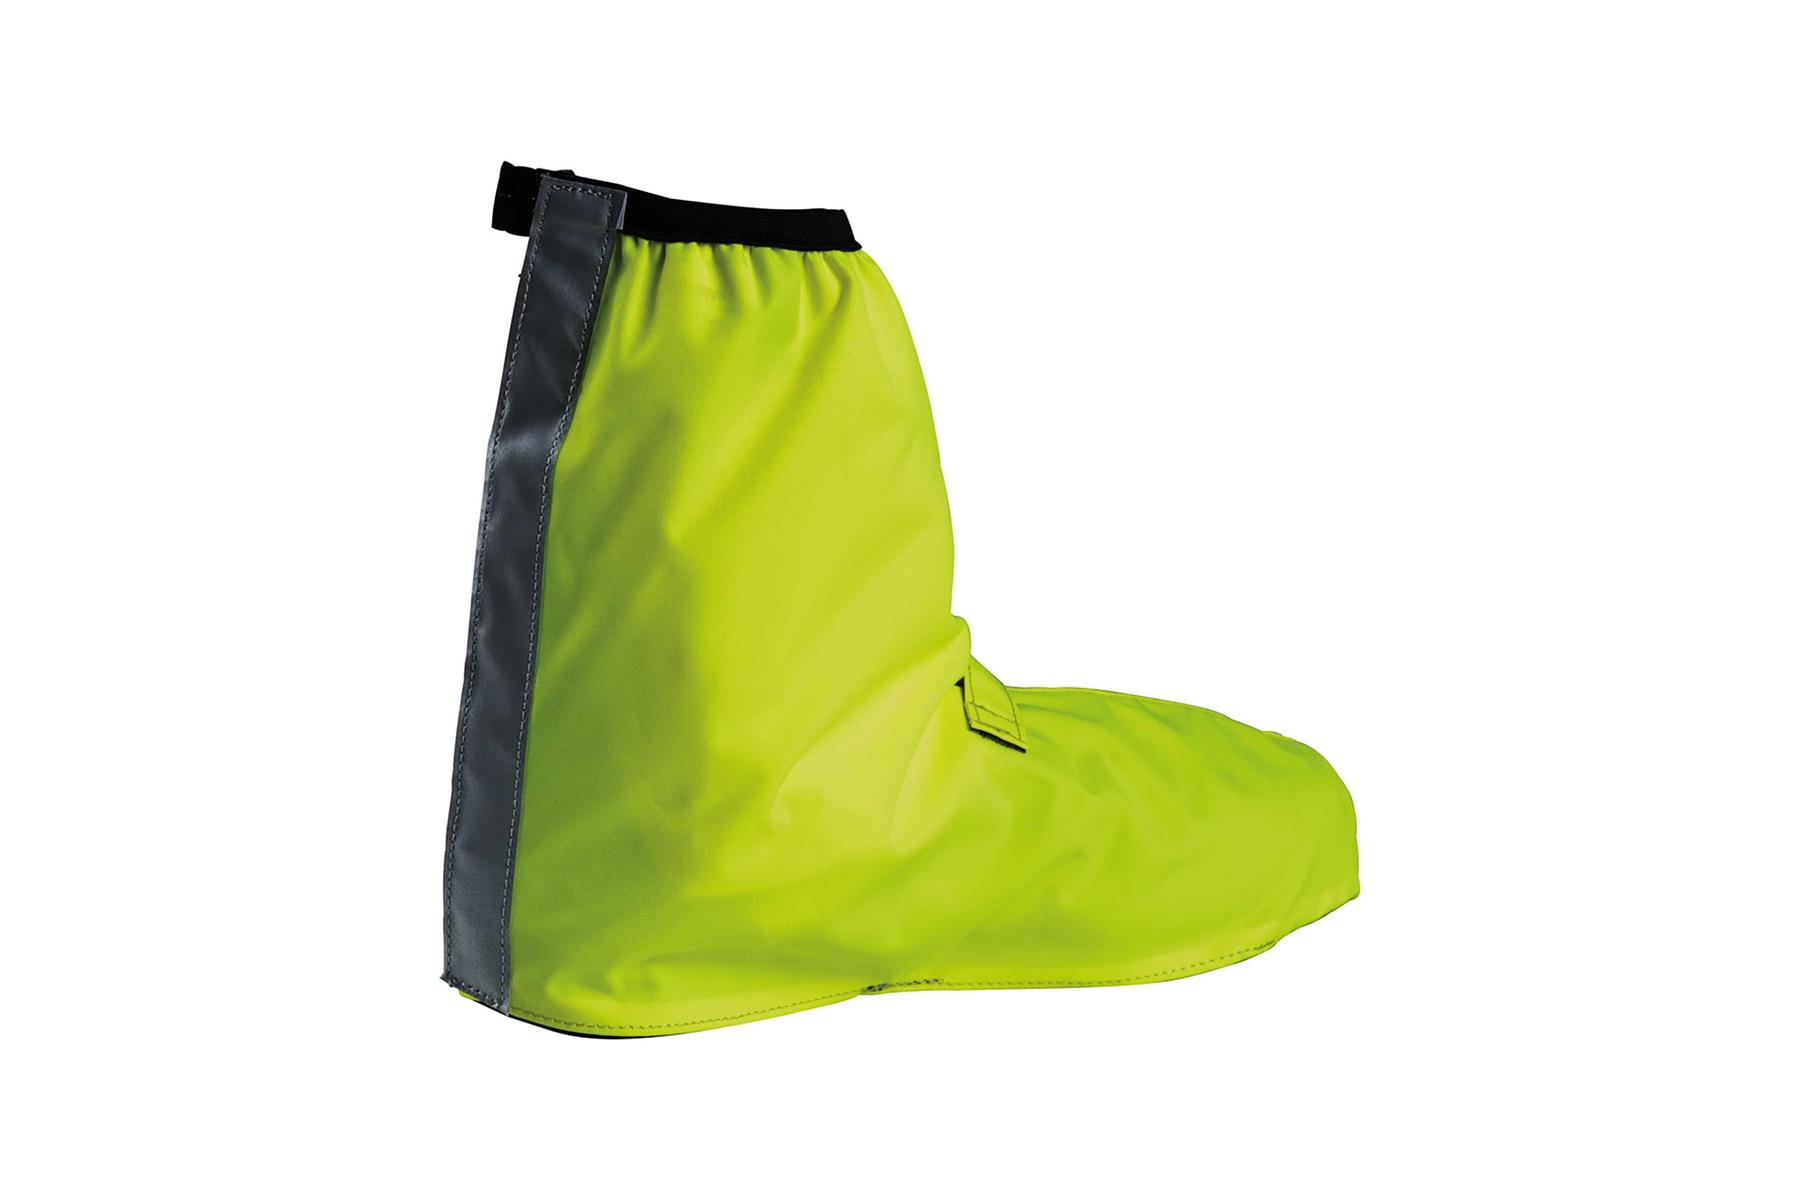 GAITER SHORT overshoes